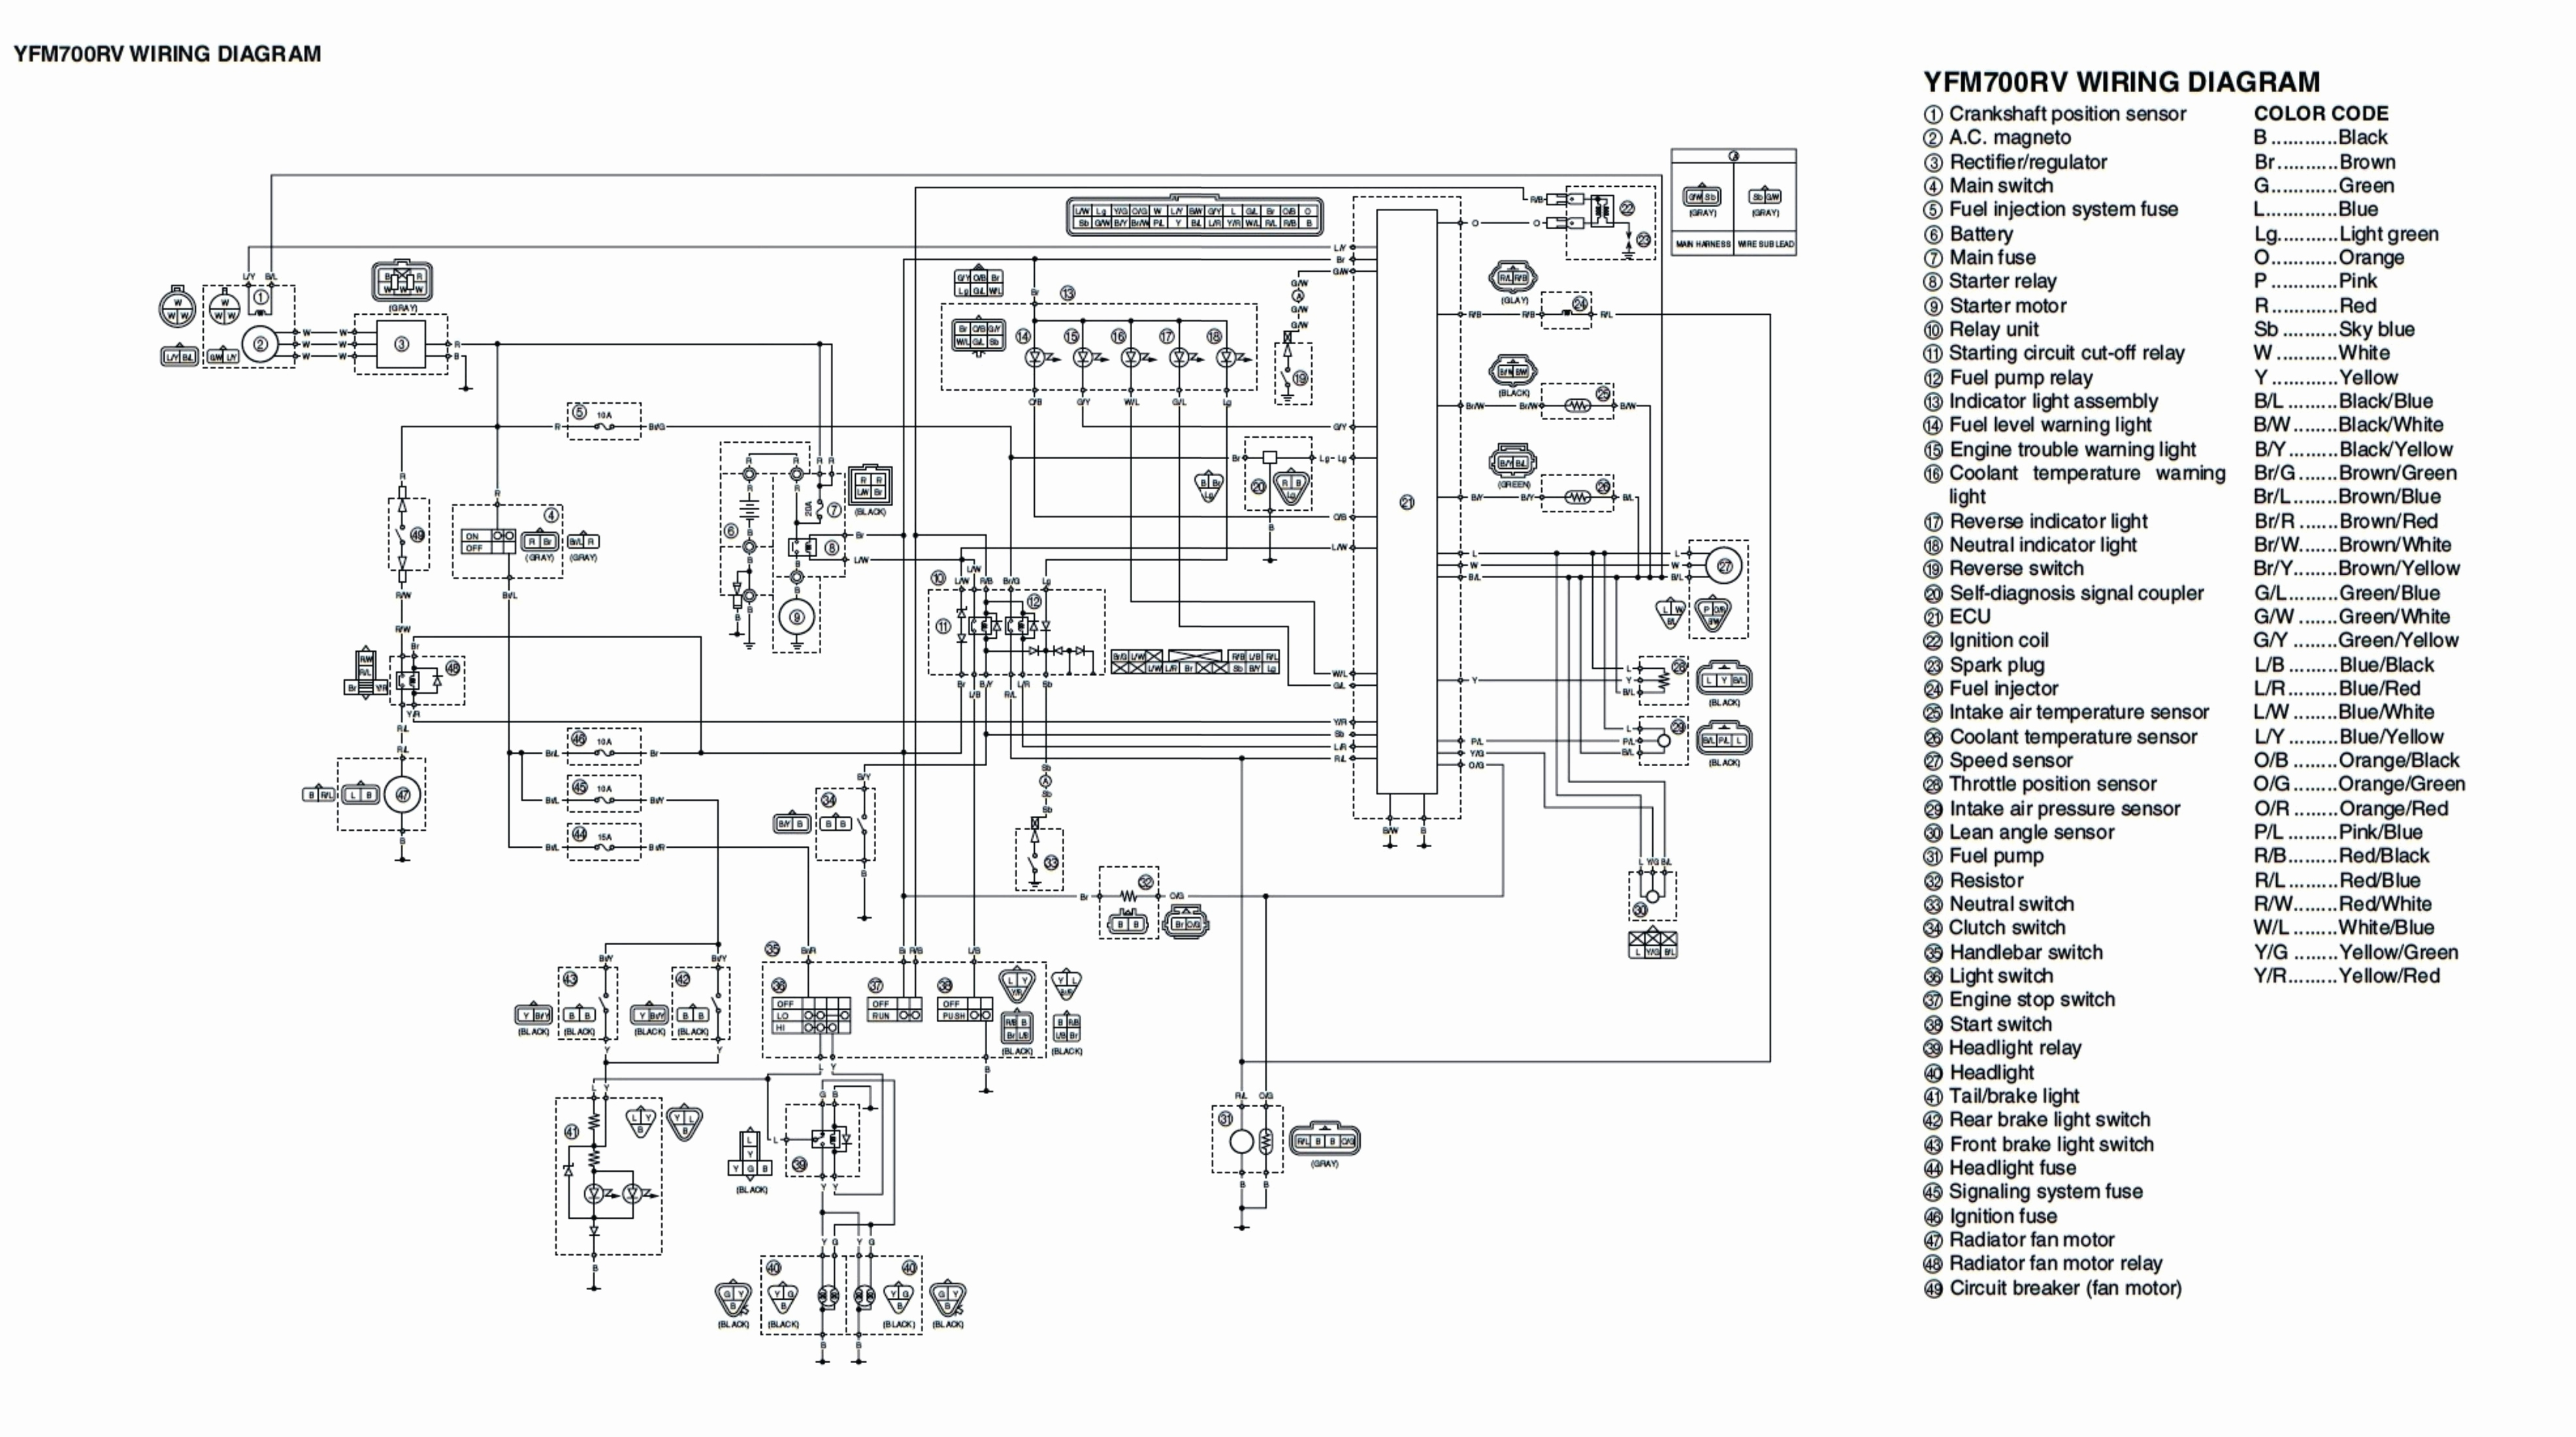 Yamaha 703 Remote Control Wiring Diagram | Manual E-Books - Yamaha 703 Remote Control Wiring Diagram